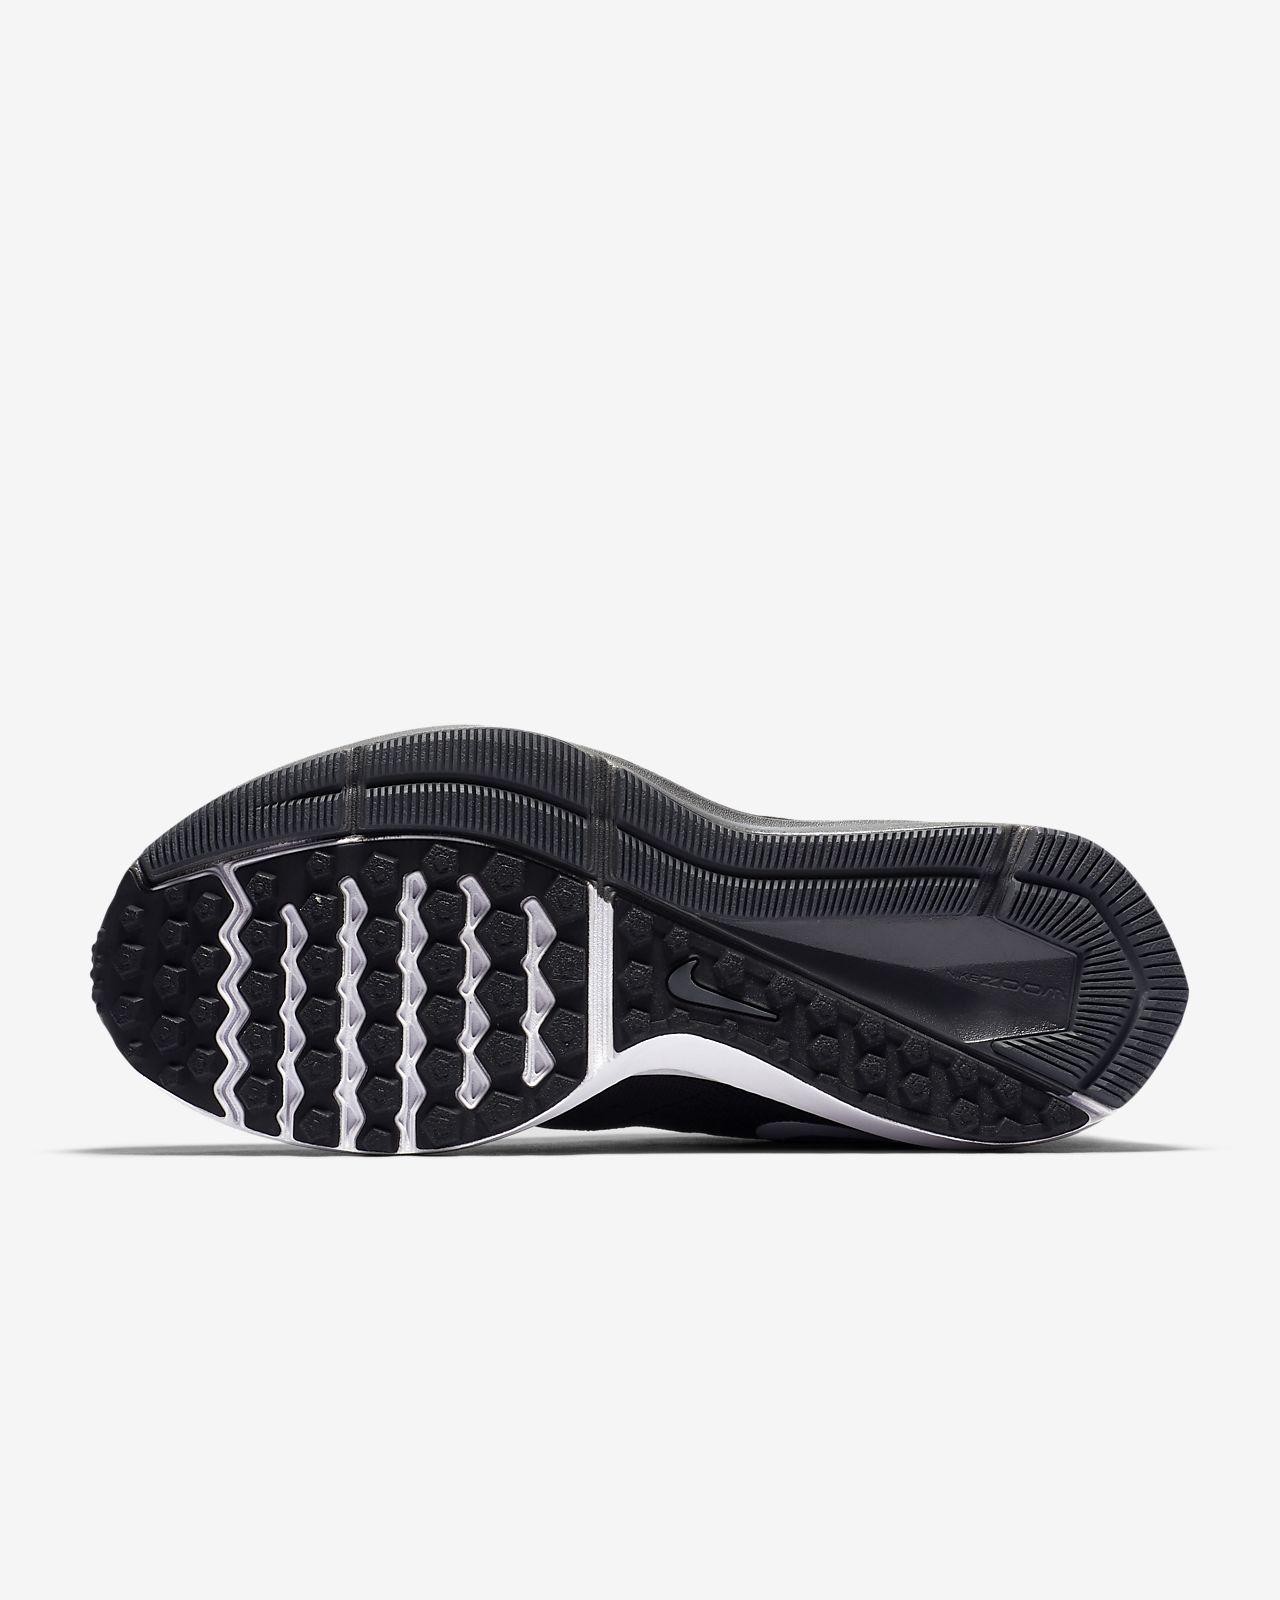 big sale 7bd72 45d9f Nike Zoom Winflo 4 Women's Running Shoe